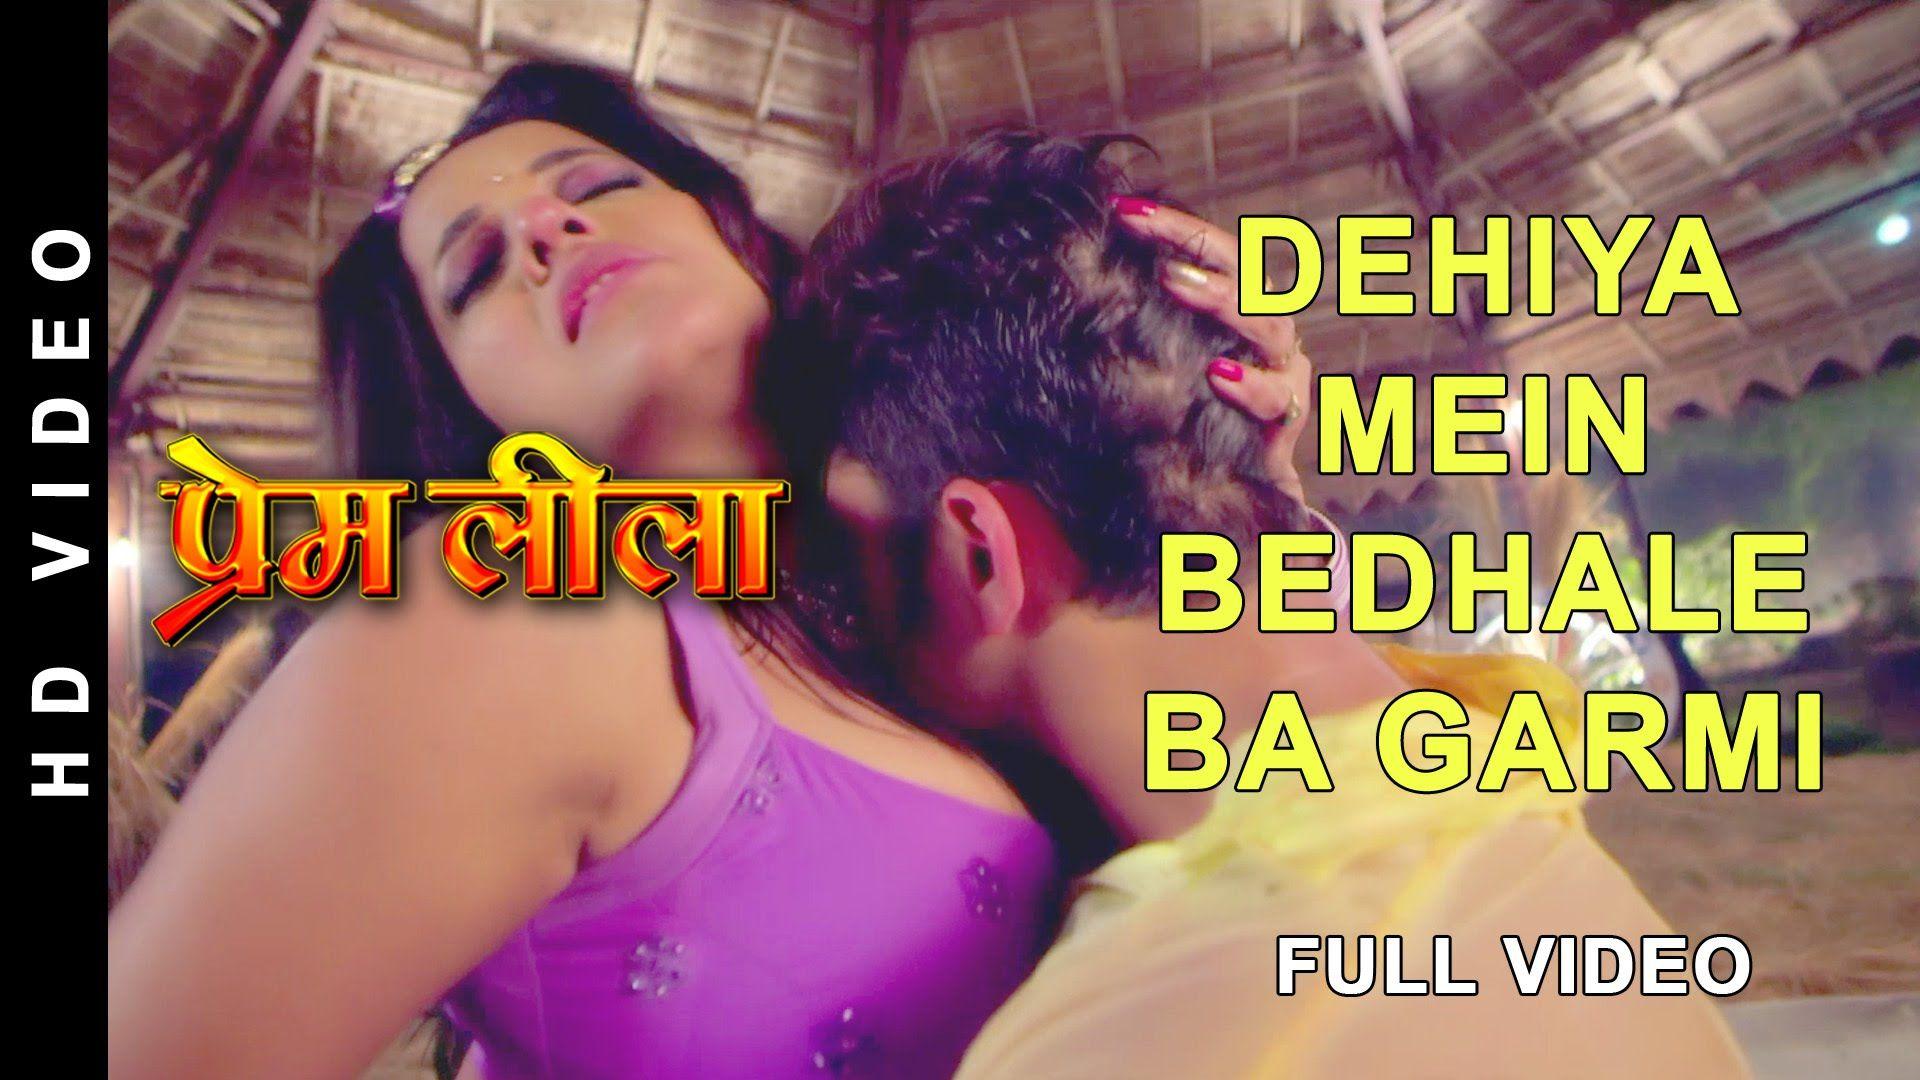 Full Video - Dehiya Mein Bedhale [ New Hot Bhojpuri Video